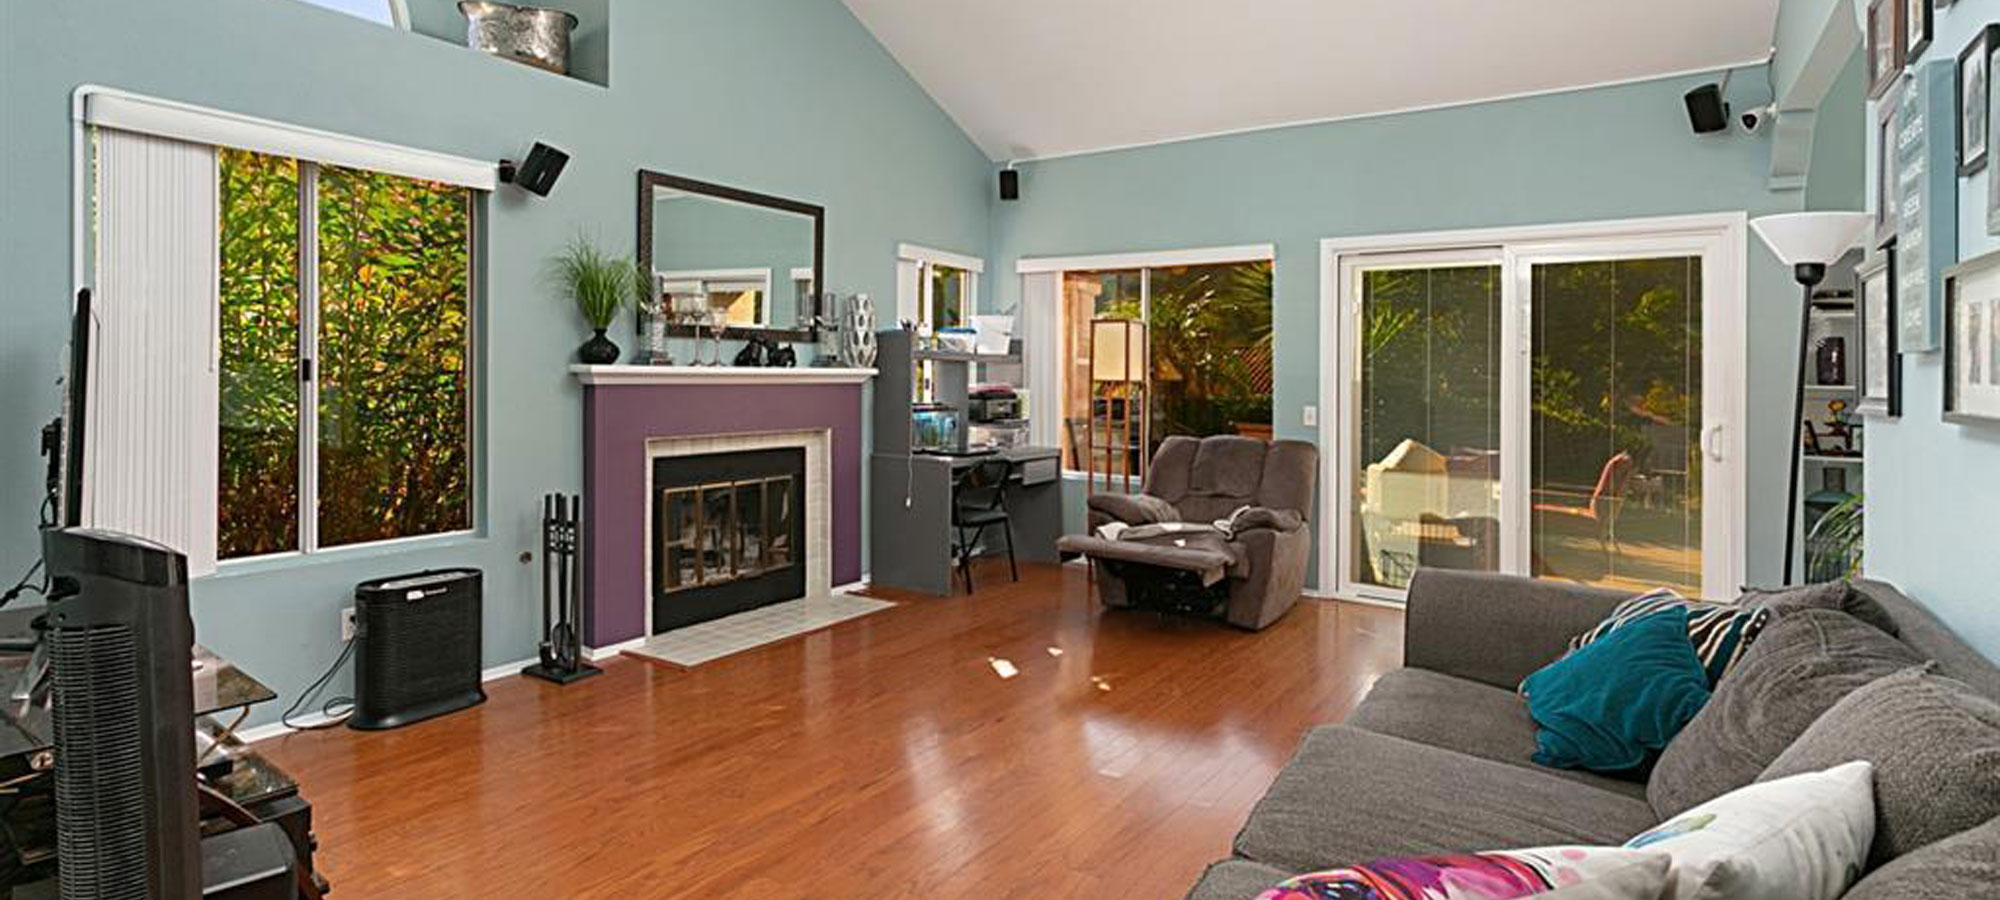 2213 Hilton Head Glen Escondido, CA 92026